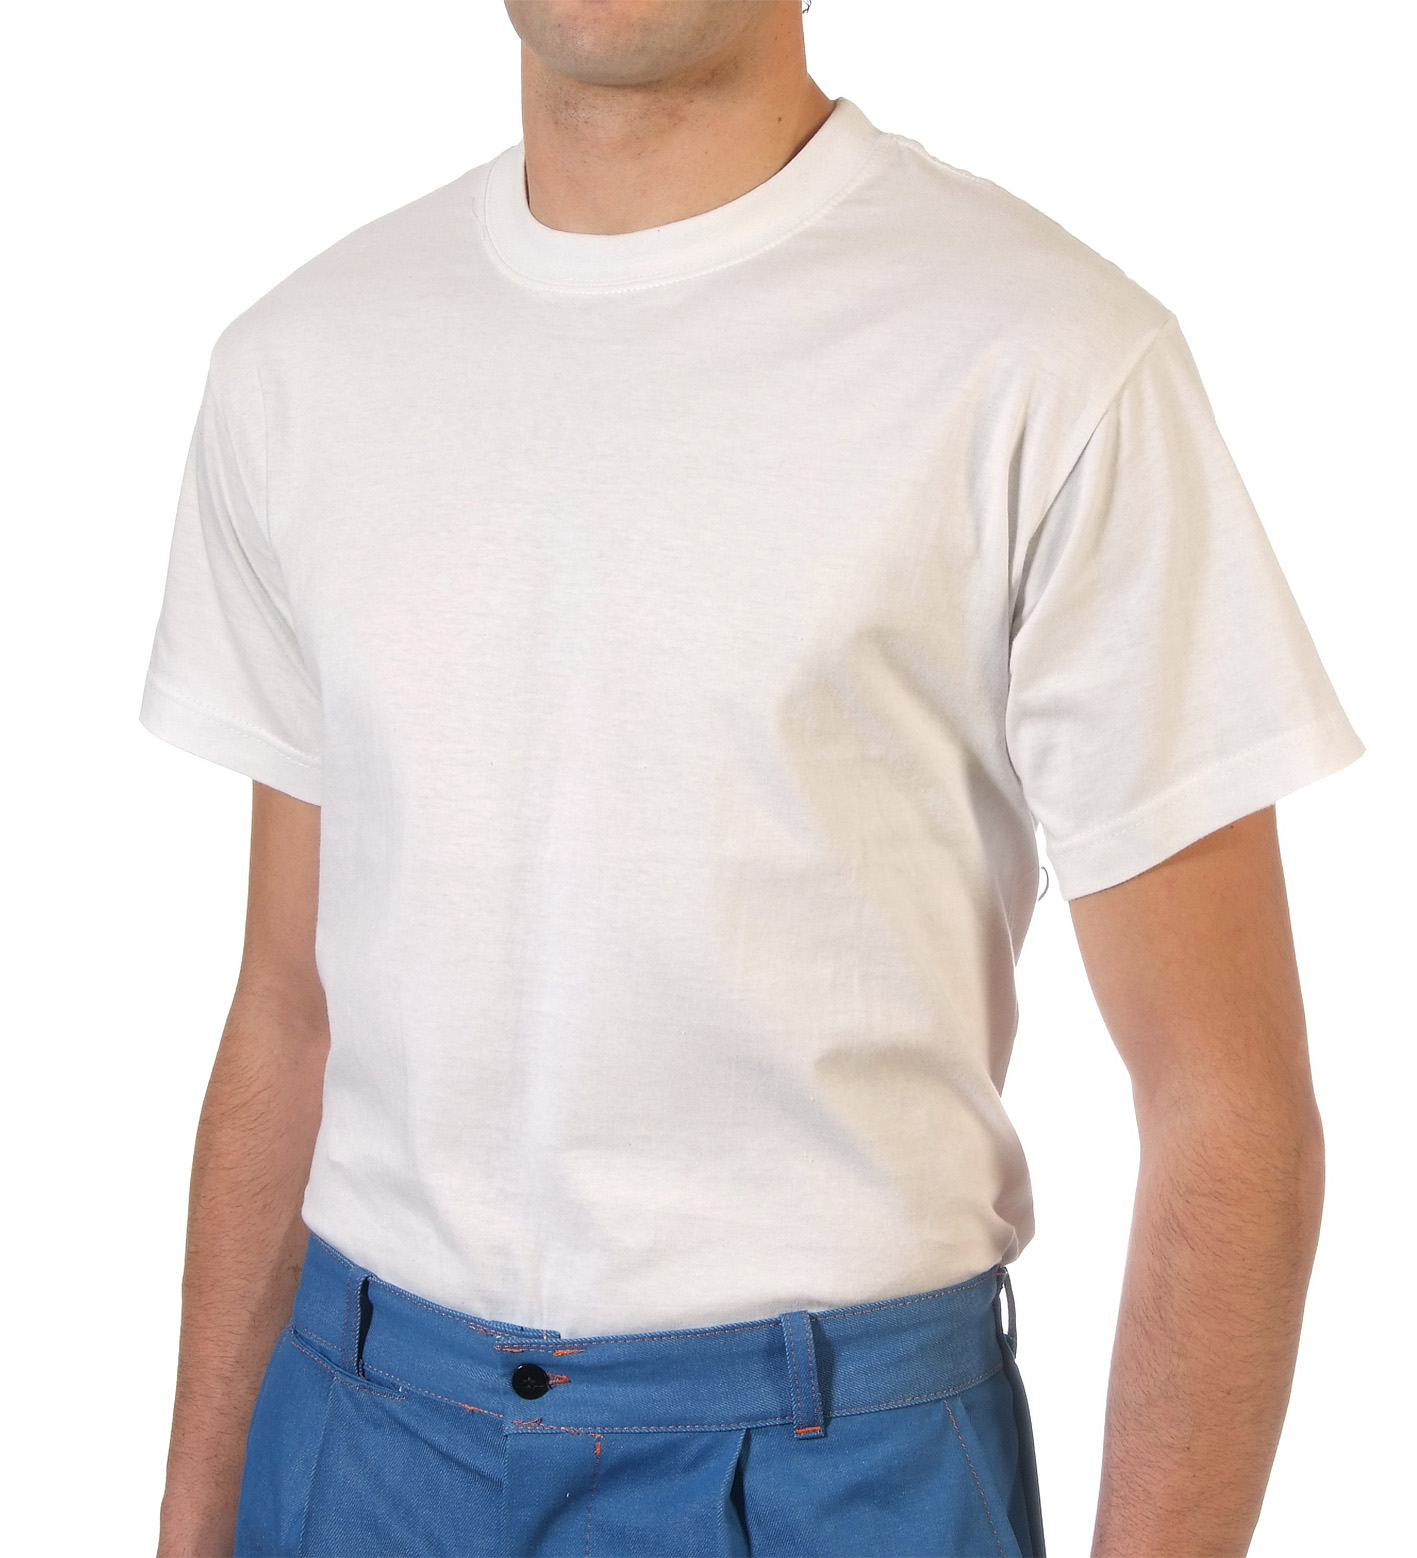 Camiseta manga corta algodón blanca Image